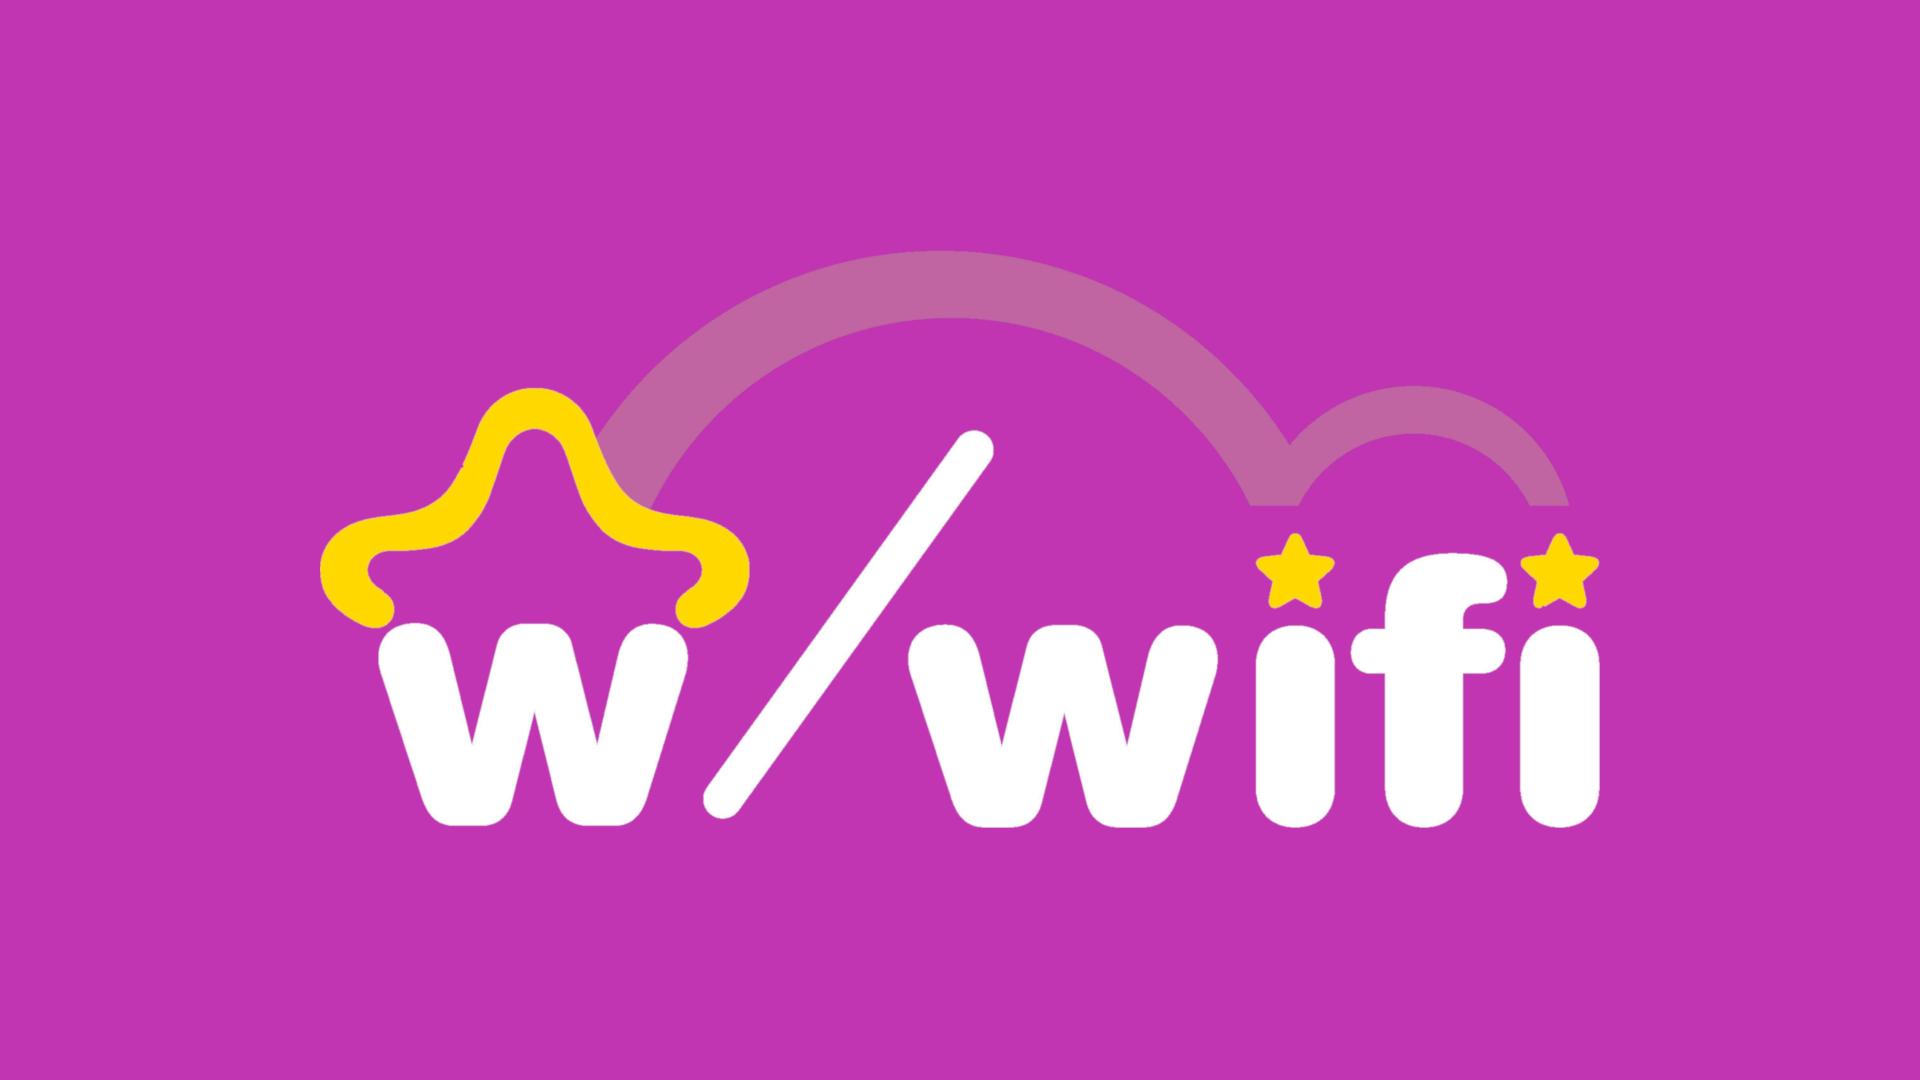 w/WiFiを契約した